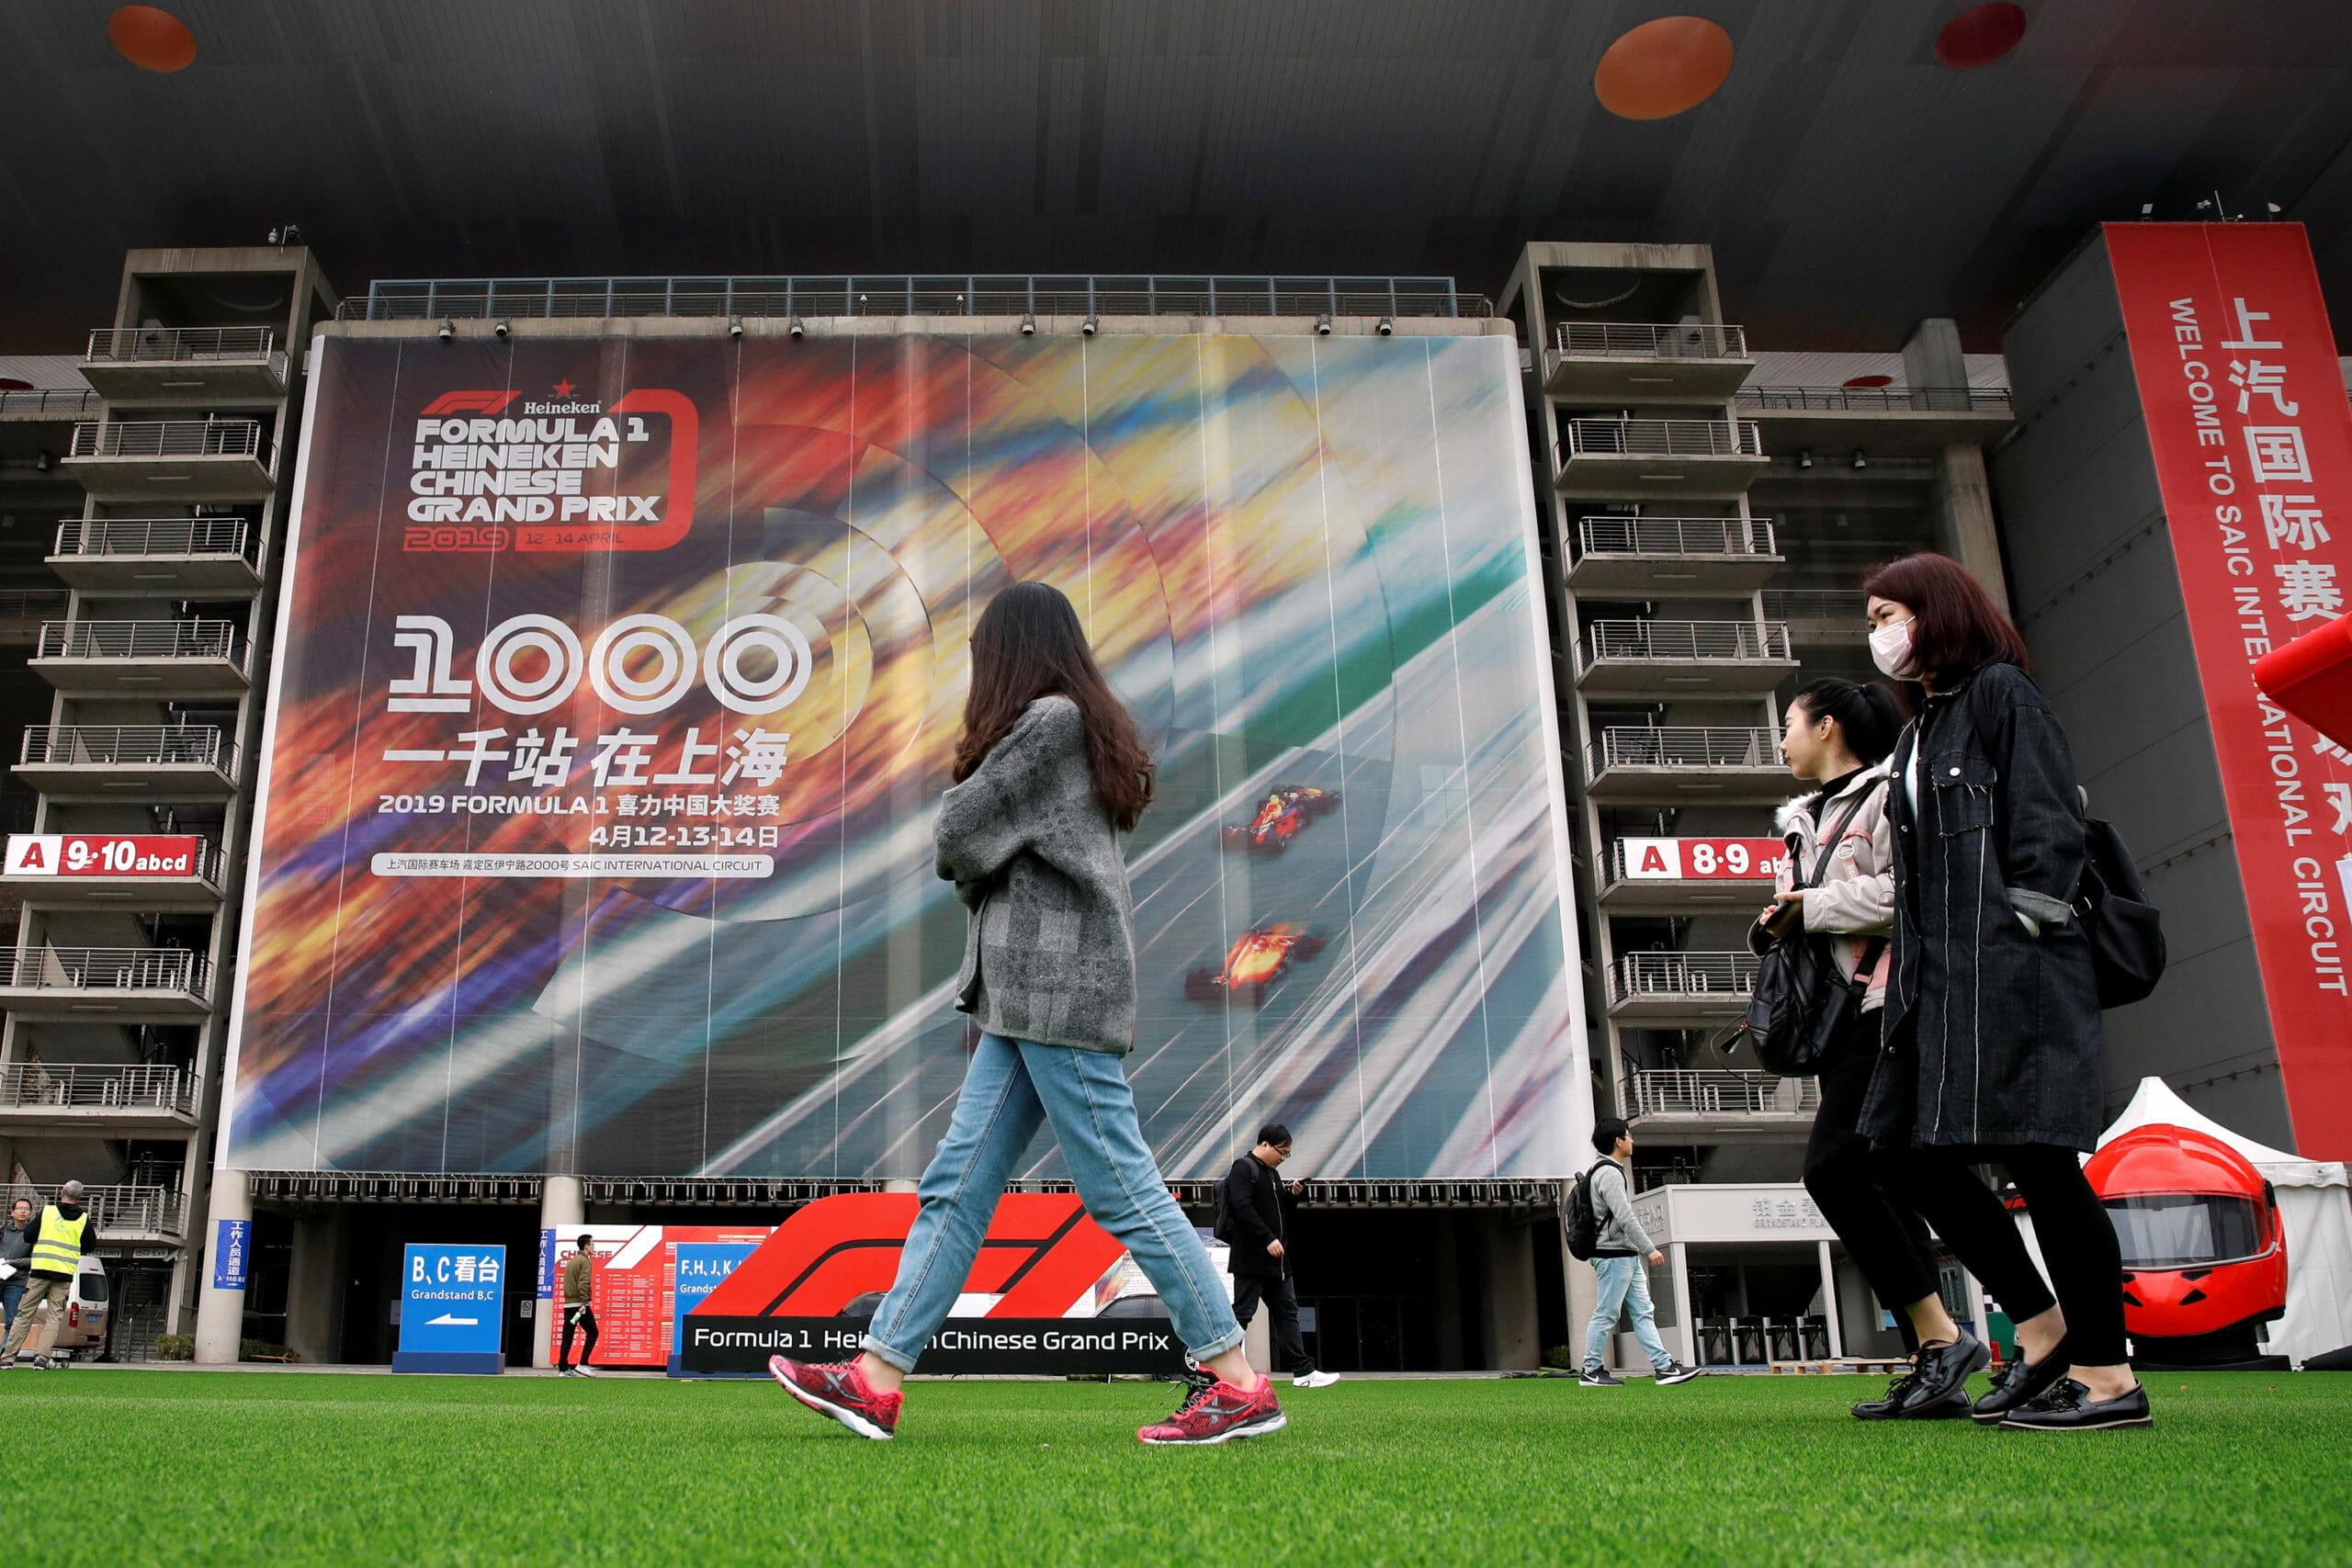 Formula 1: Επίσημη αναβολή σε 4 Γκραν Πρι! Tέλος Μαΐου αναμένεται η έναρξη της σεζόν